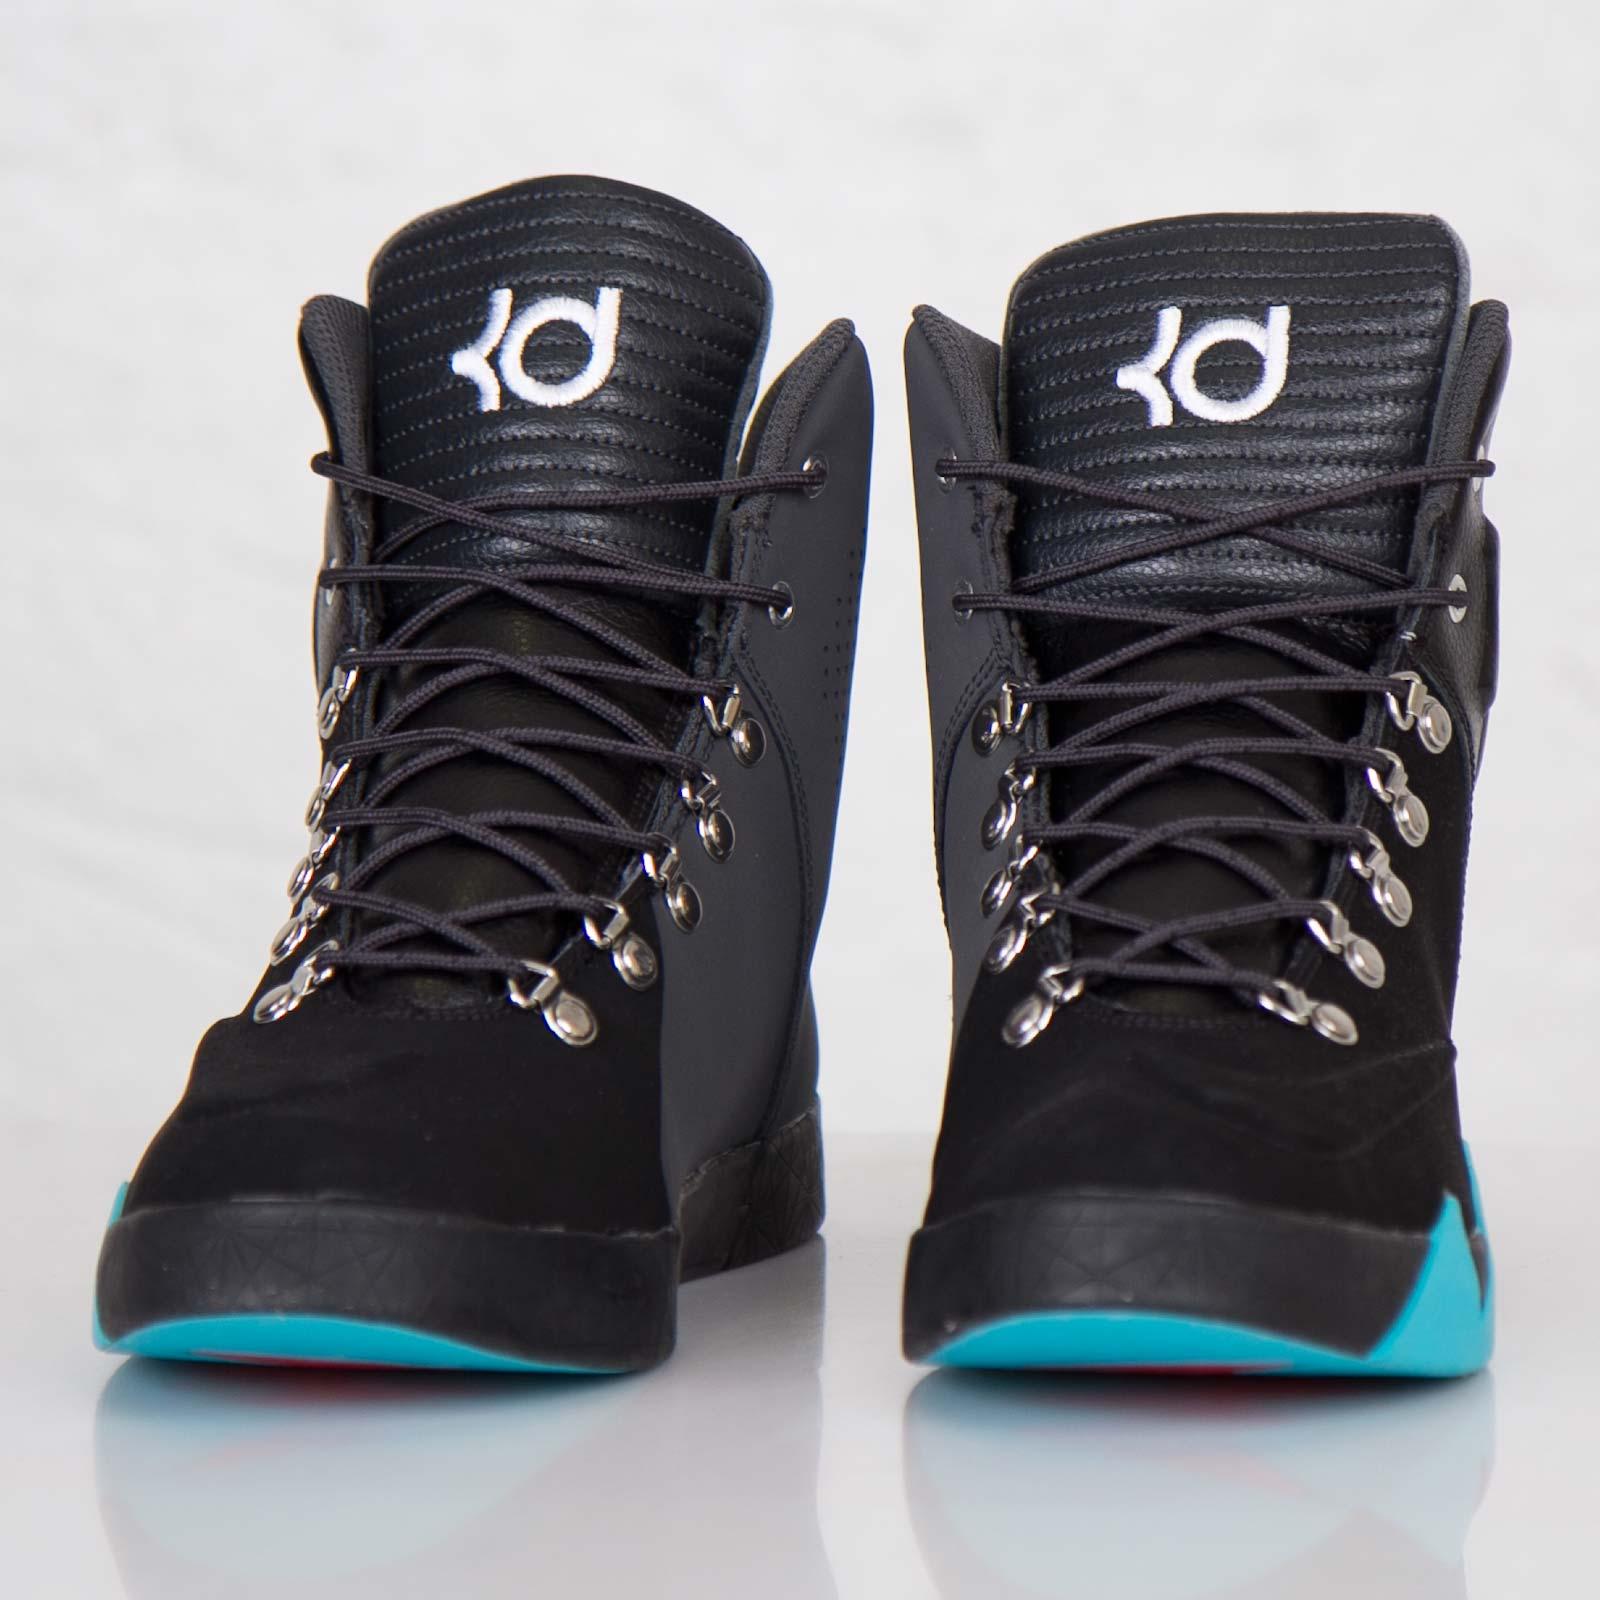 buy popular 31970 97c44 Nike KD VI NSW Lifestyle Leather QS - 621945-001 - Sneakersnstuff    sneakers   streetwear online since 1999